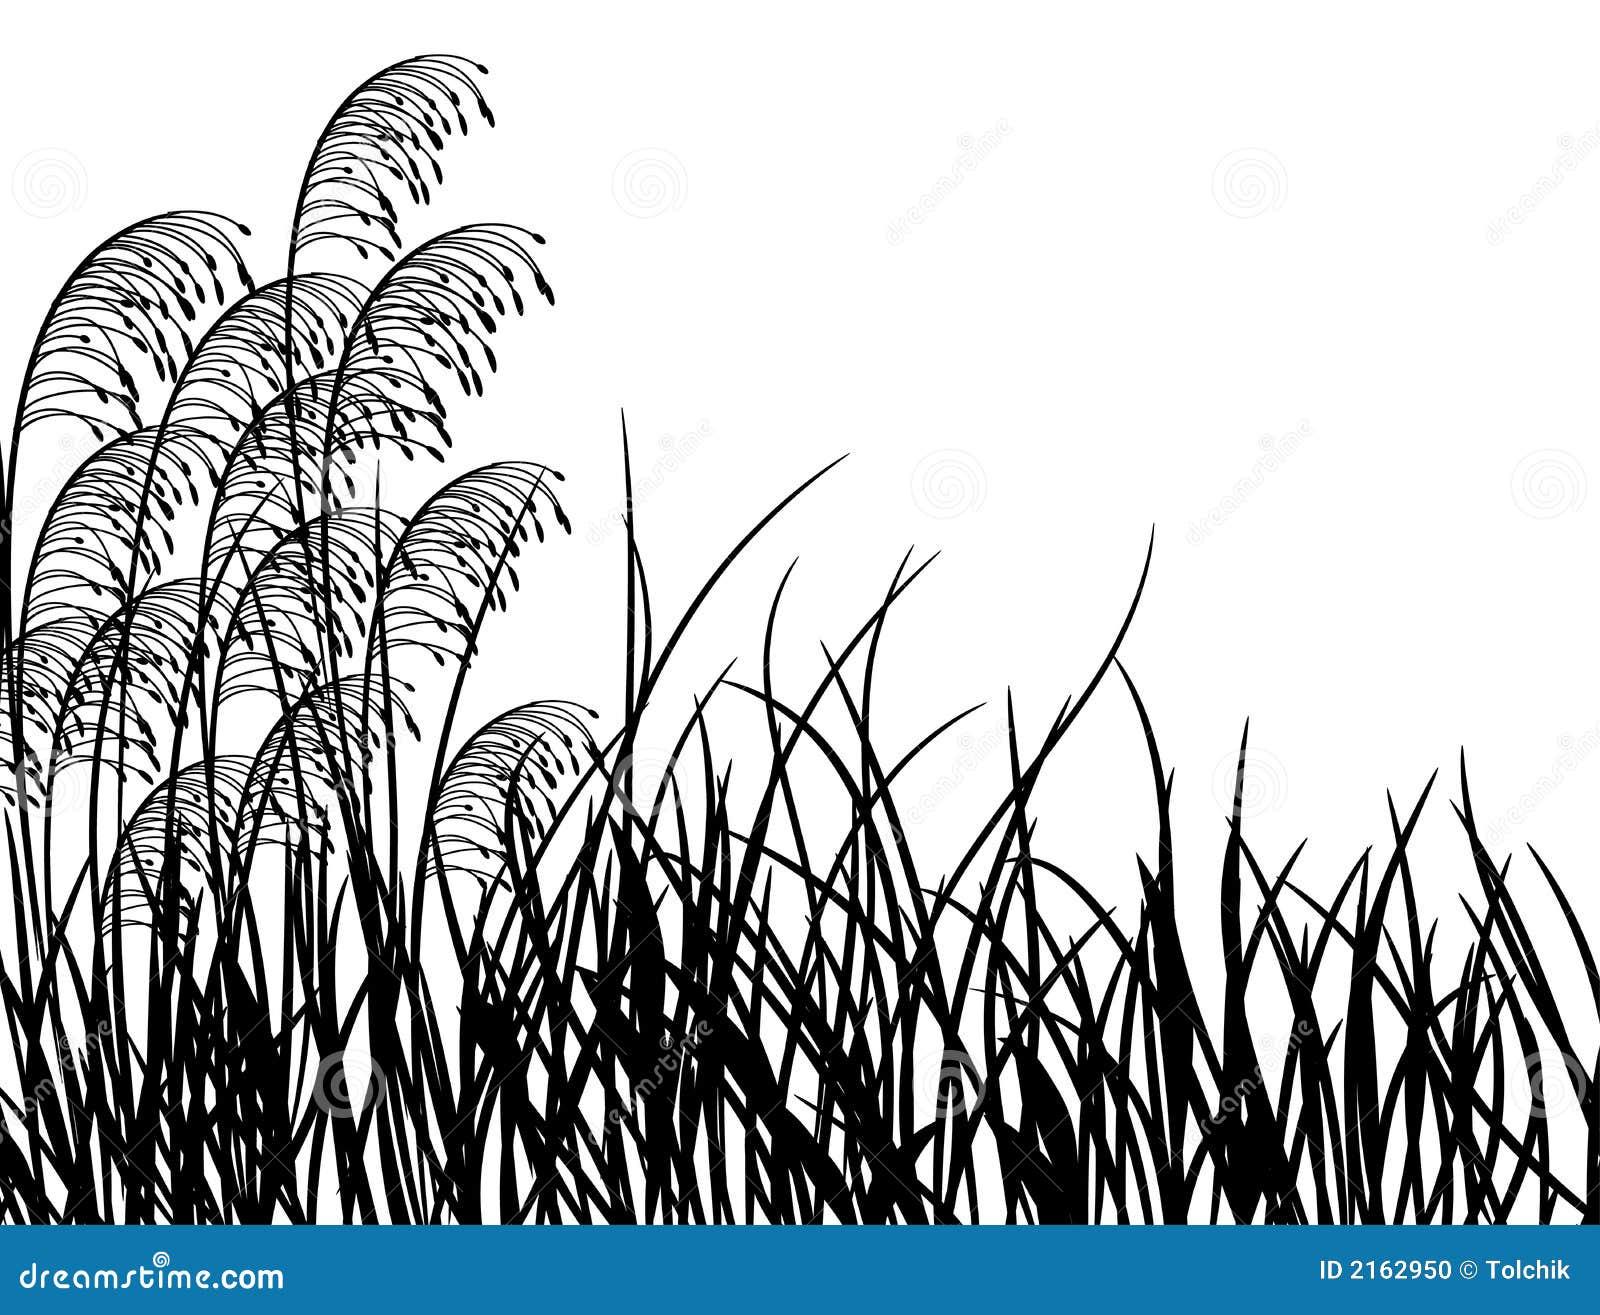 Meadow grass, vector stock vector. Illustration of flower - 2162950